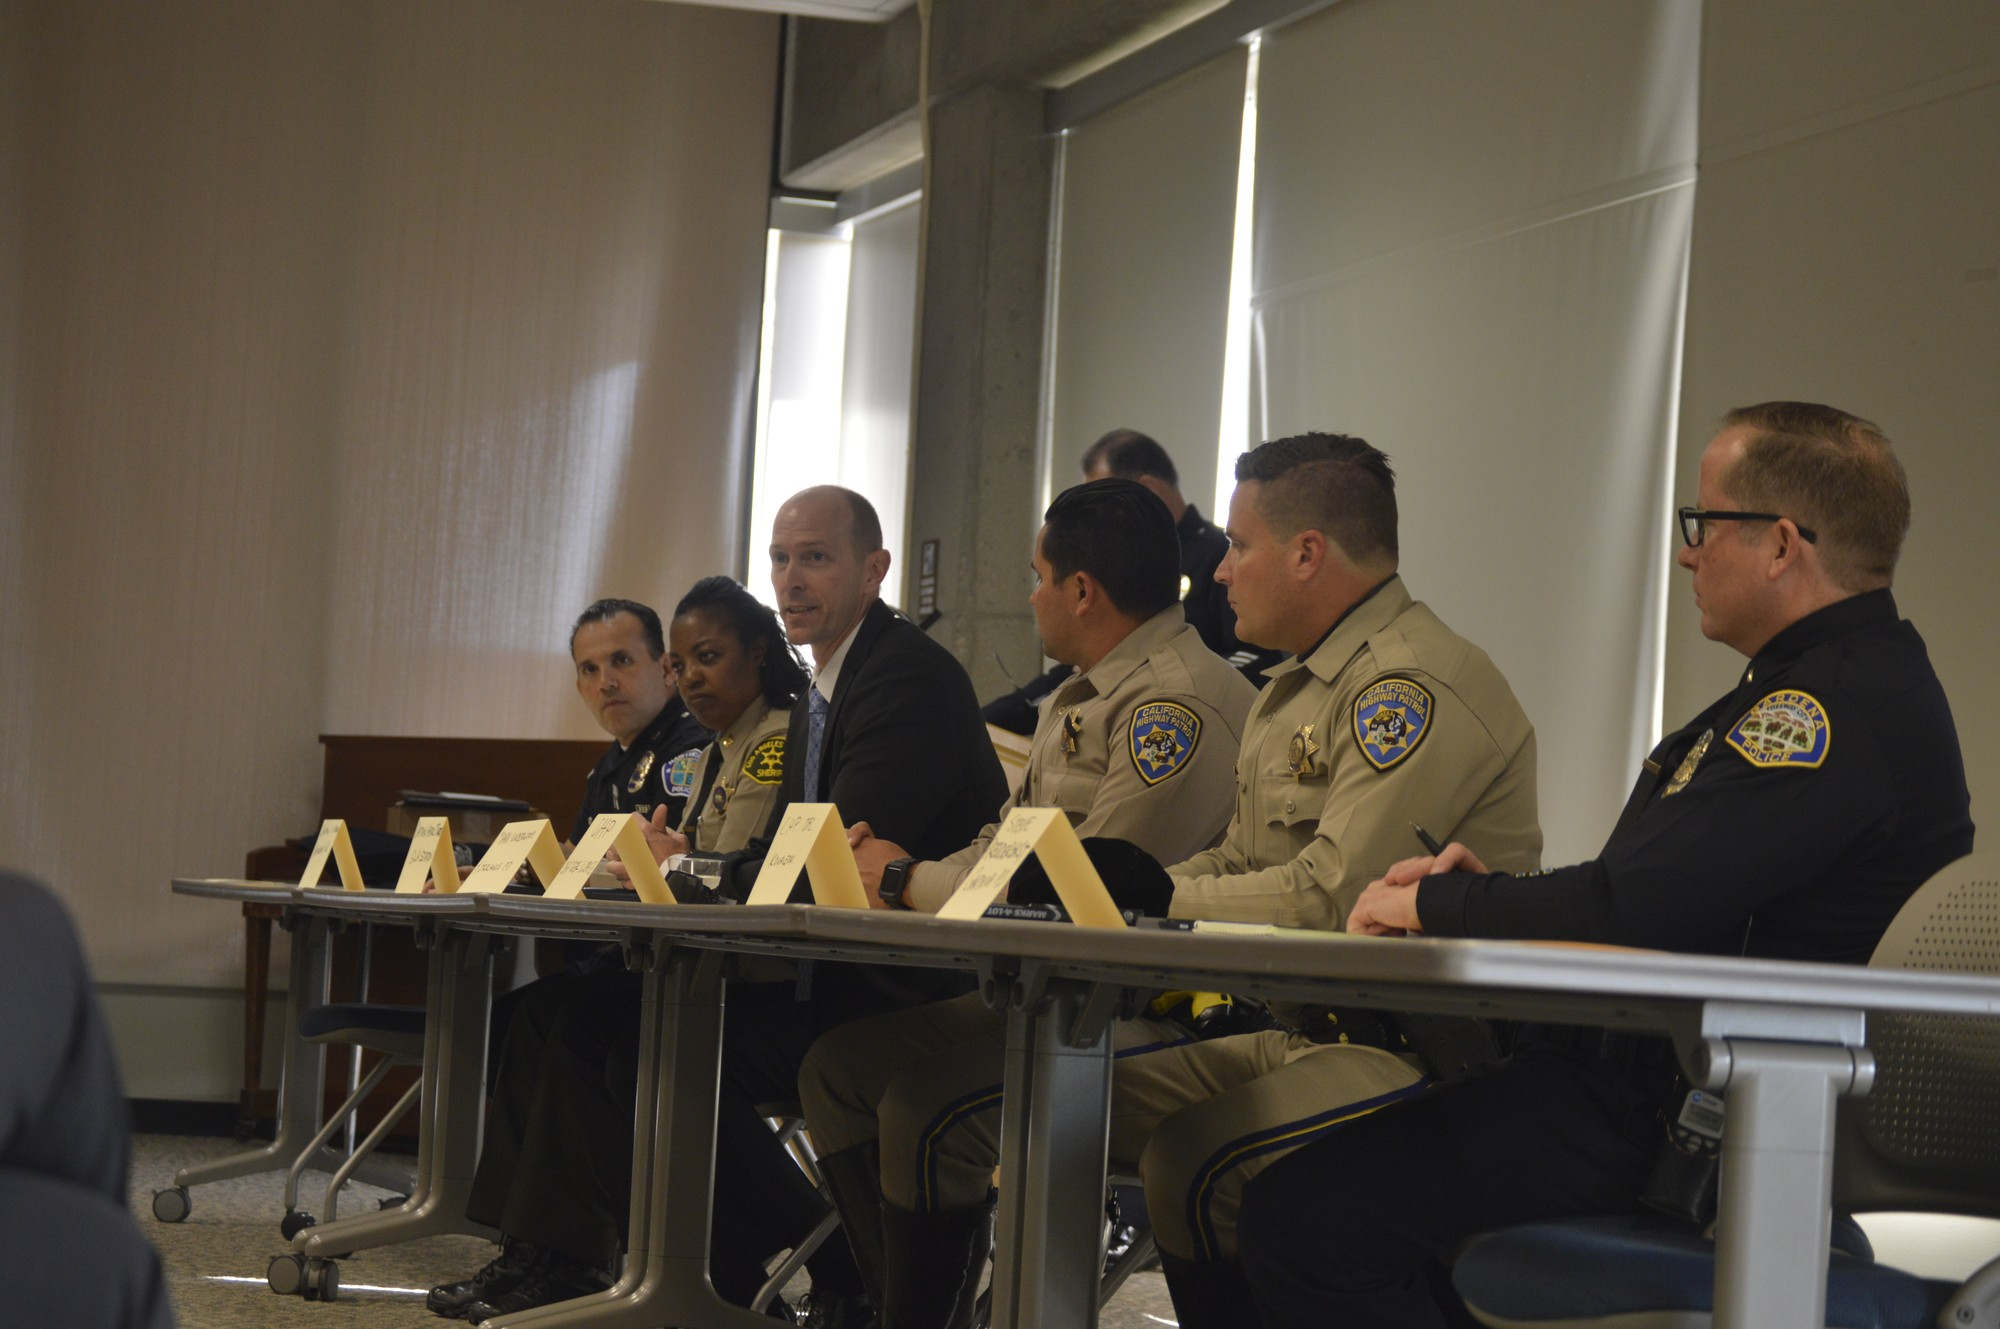 EC hosts campus safety forums for public